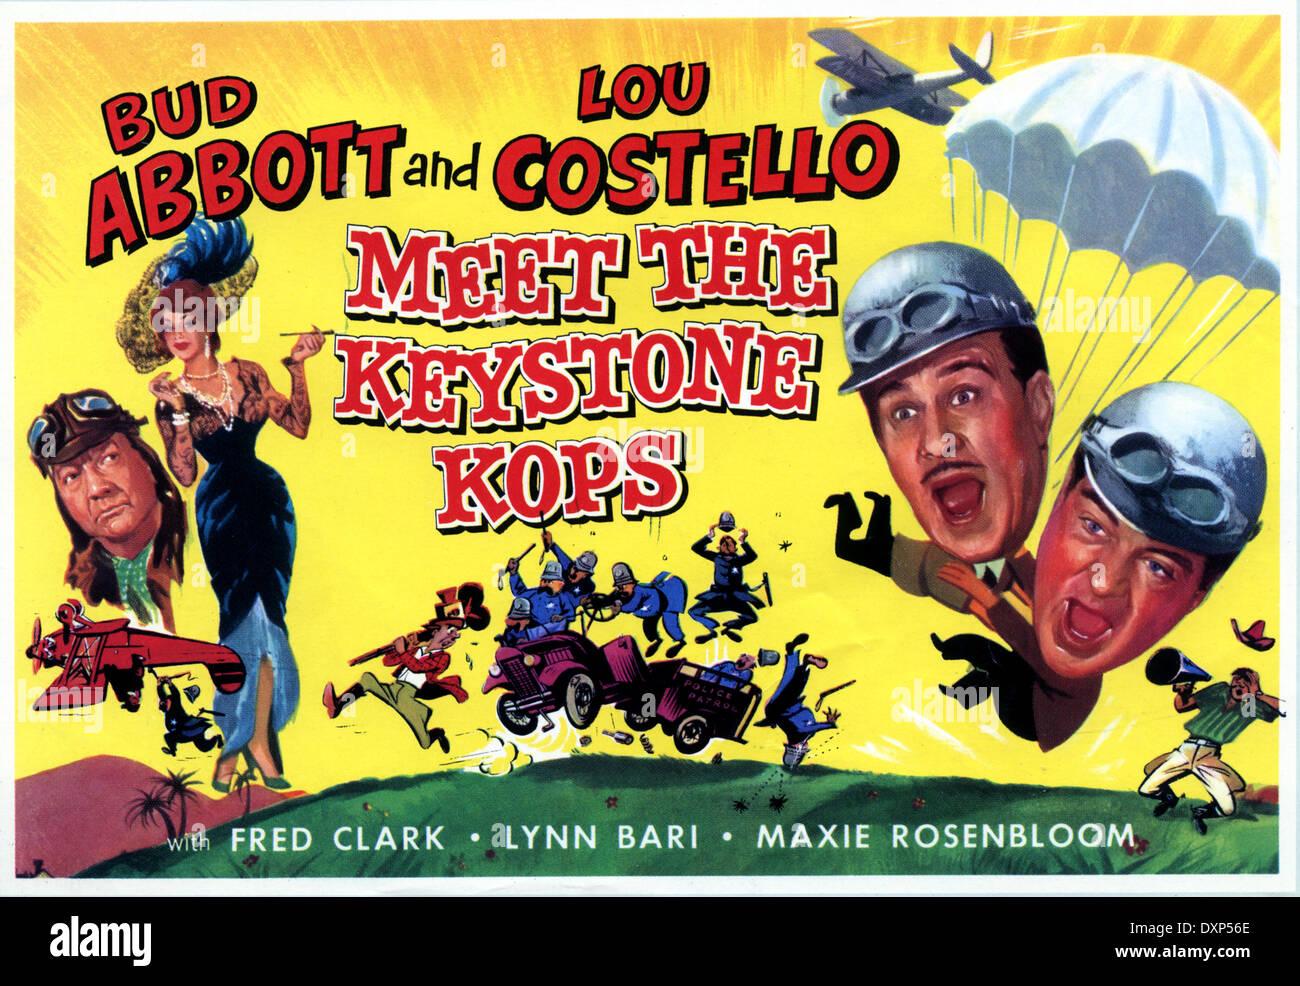 watch abbott and costello meet the keystone kops